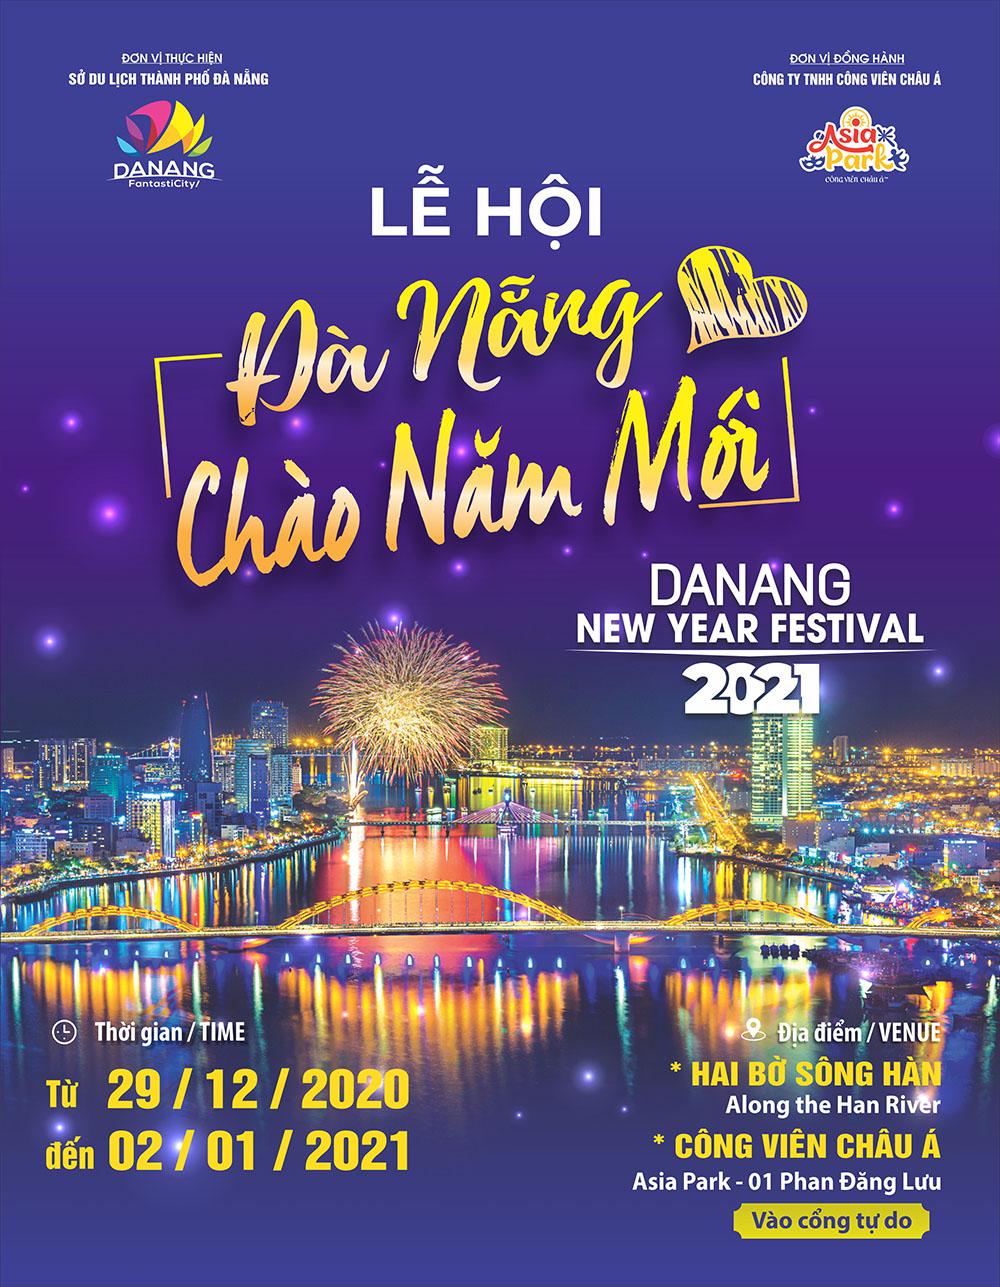 Le Hoi Da Nang Chao Nam Moi